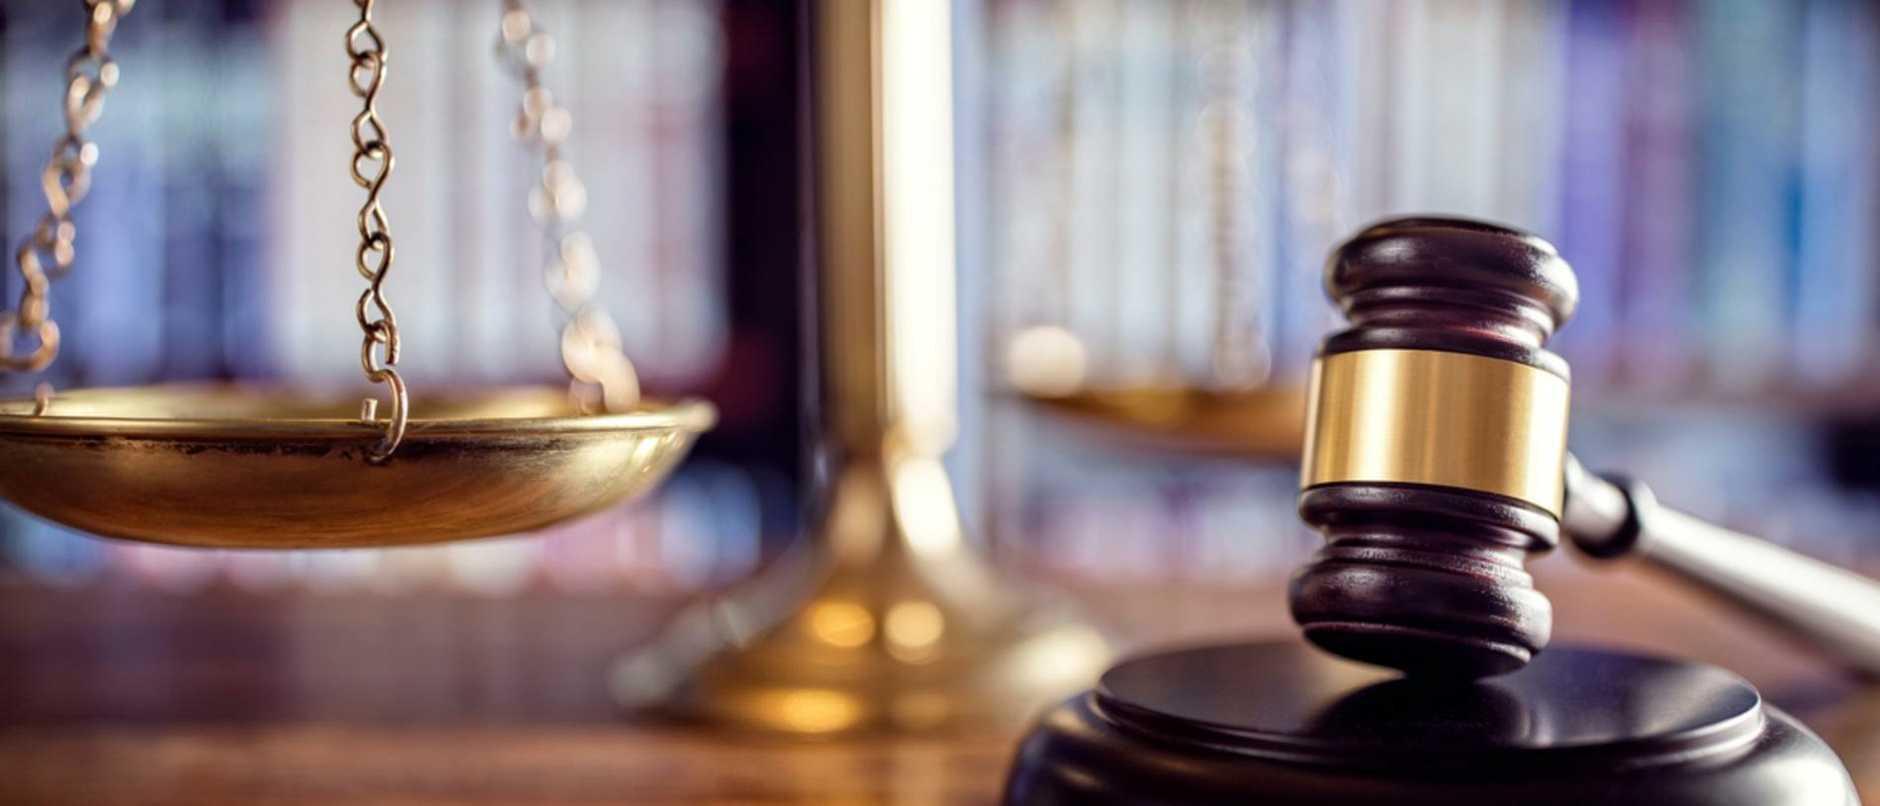 District Court criminal sittings at Brisbane, December 4